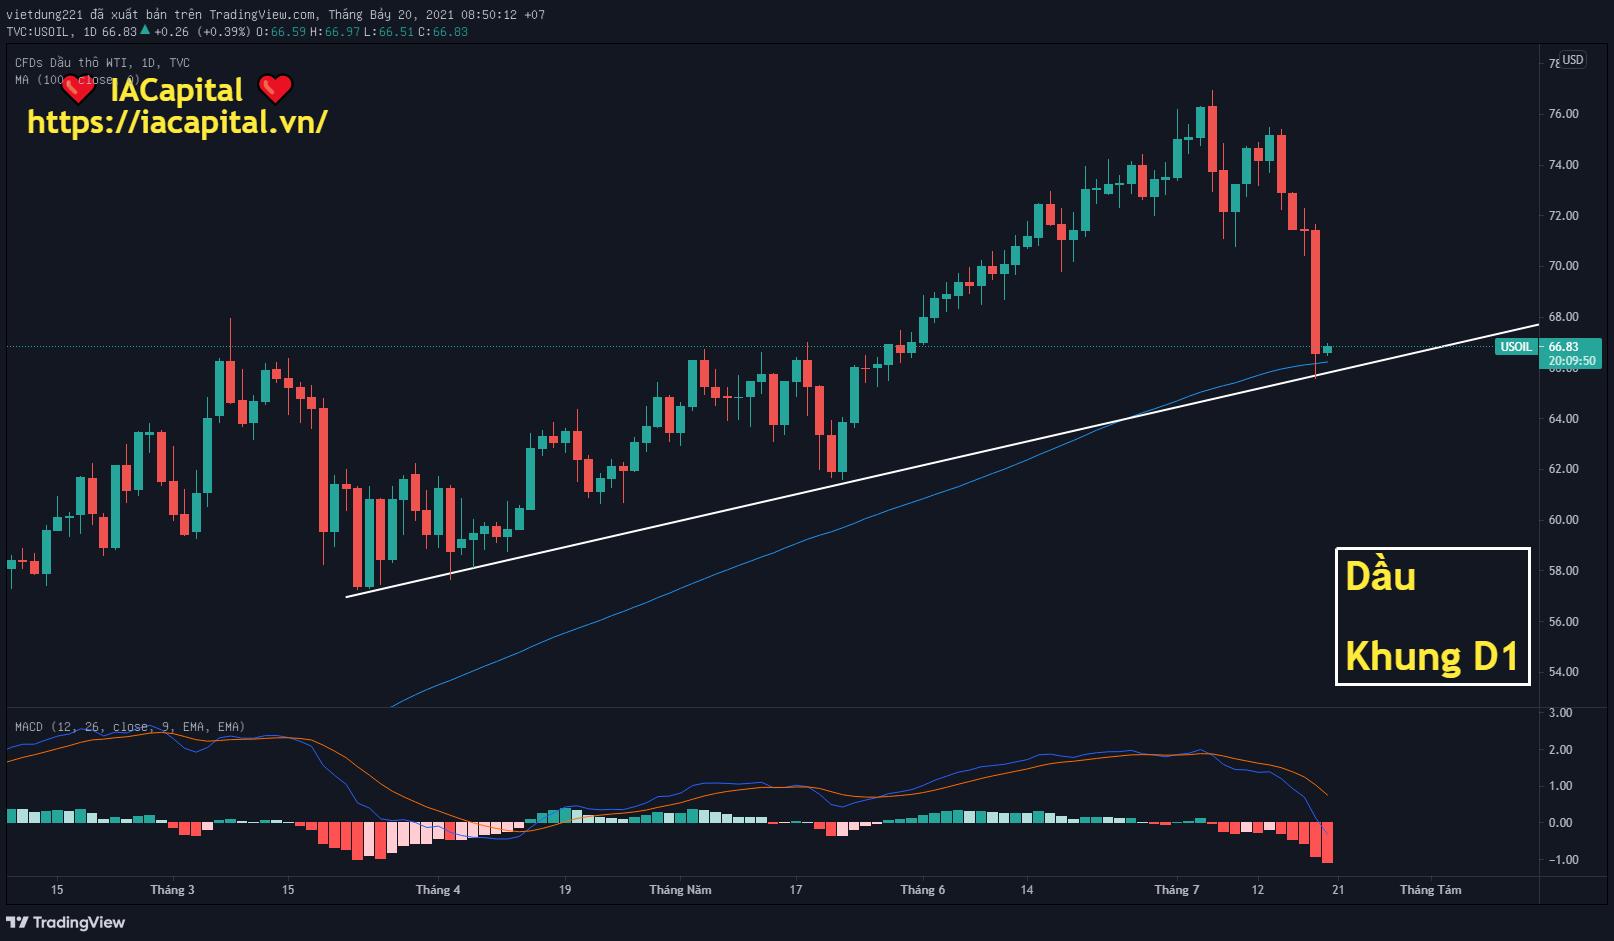 https://s3.tradingview.com/snapshots/g/GHhni6wH.png